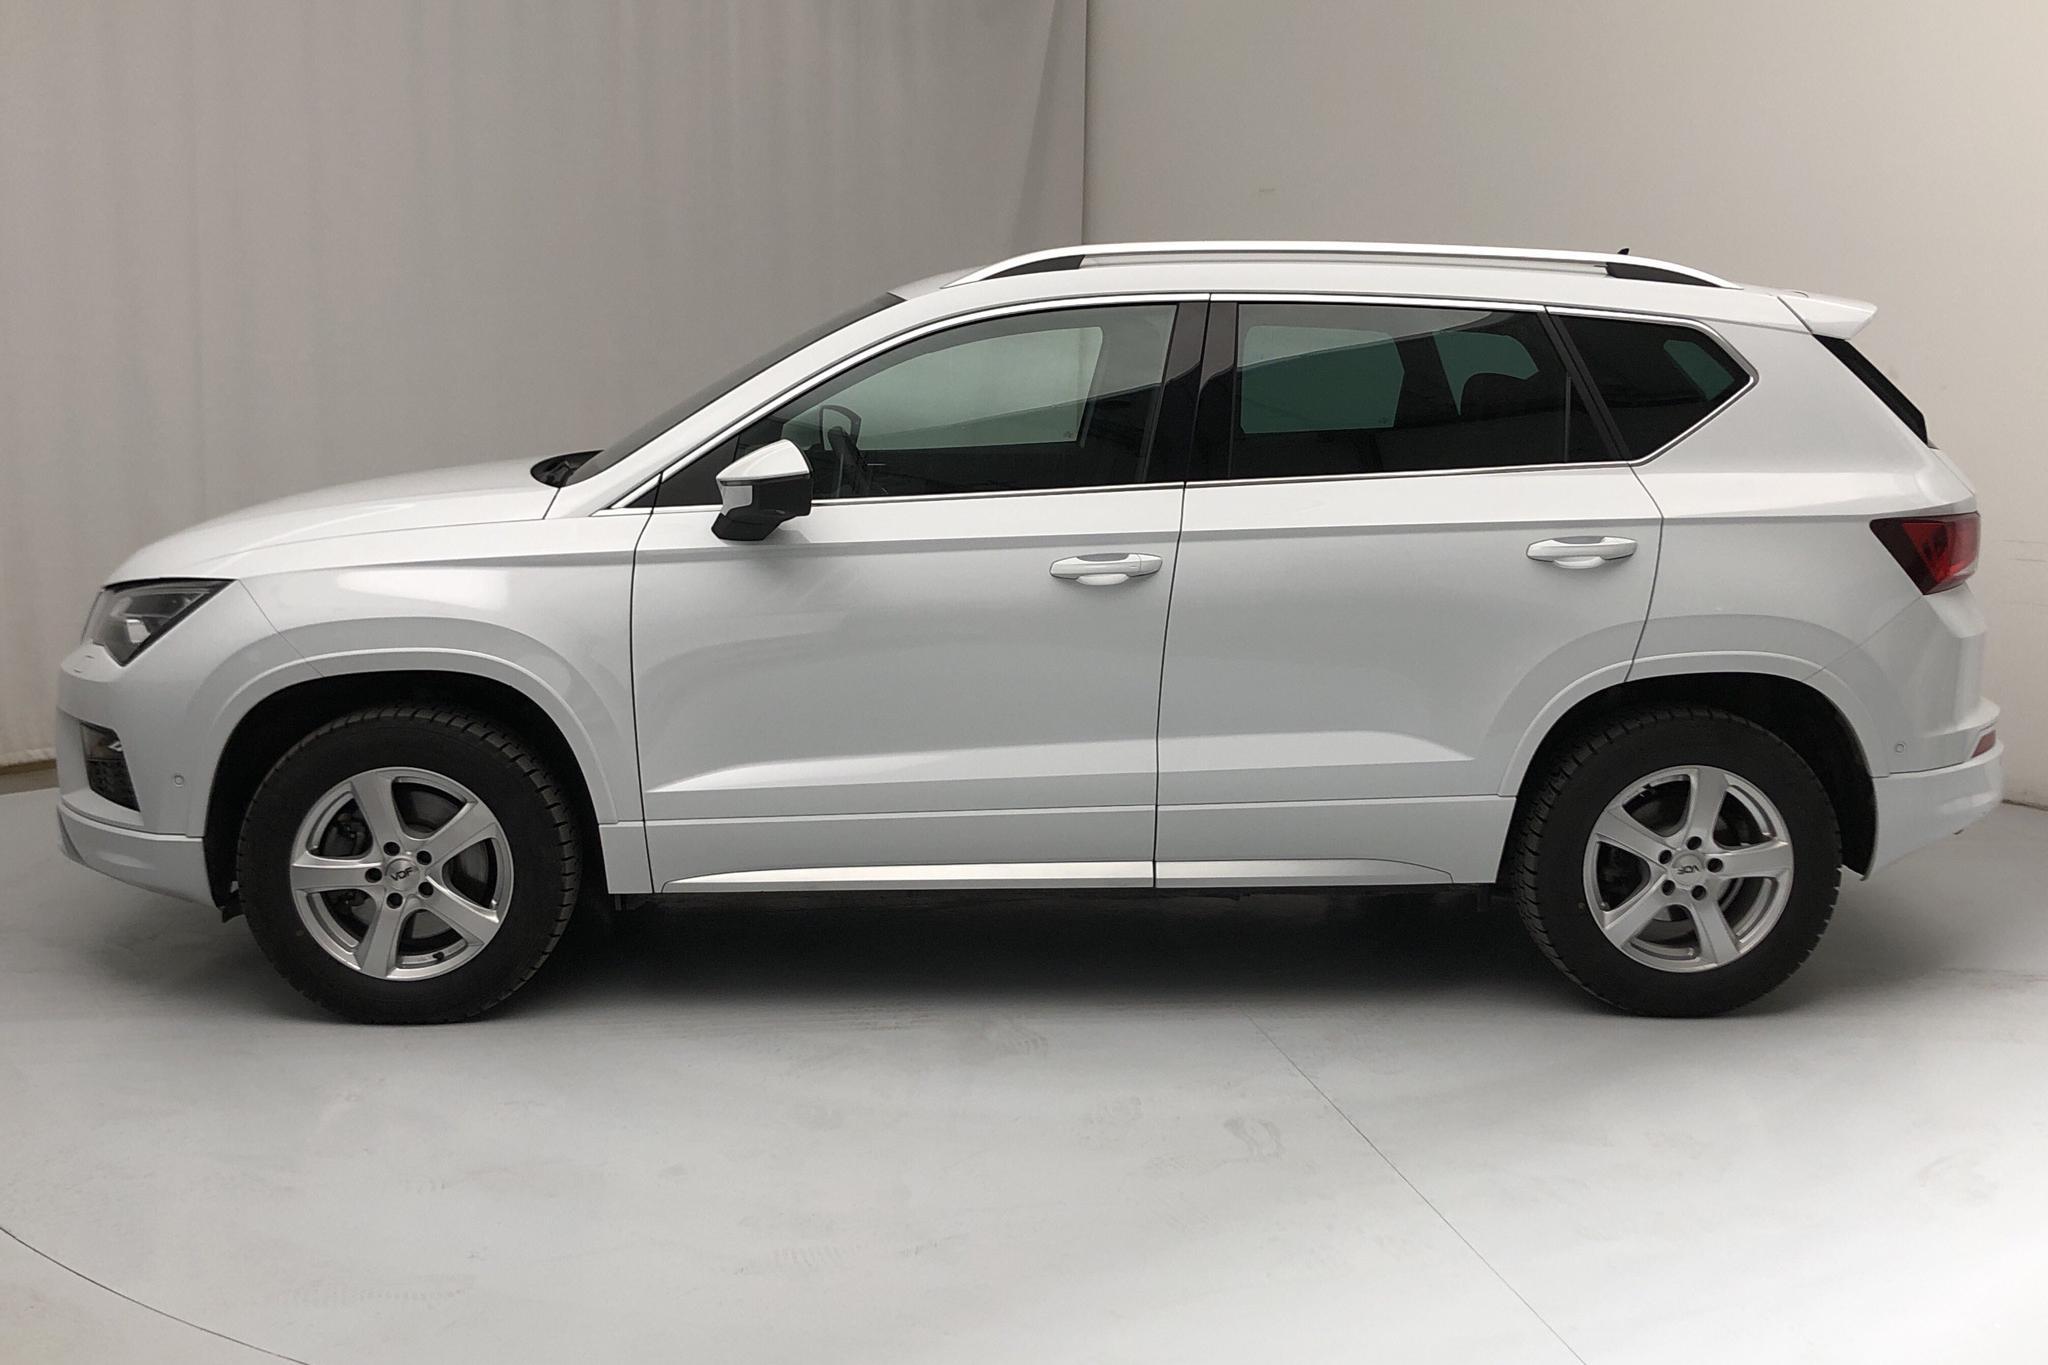 Seat Ateca 2.0 TSI 4Drive (190hk) - 47 950 km - Automatic - white - 2018